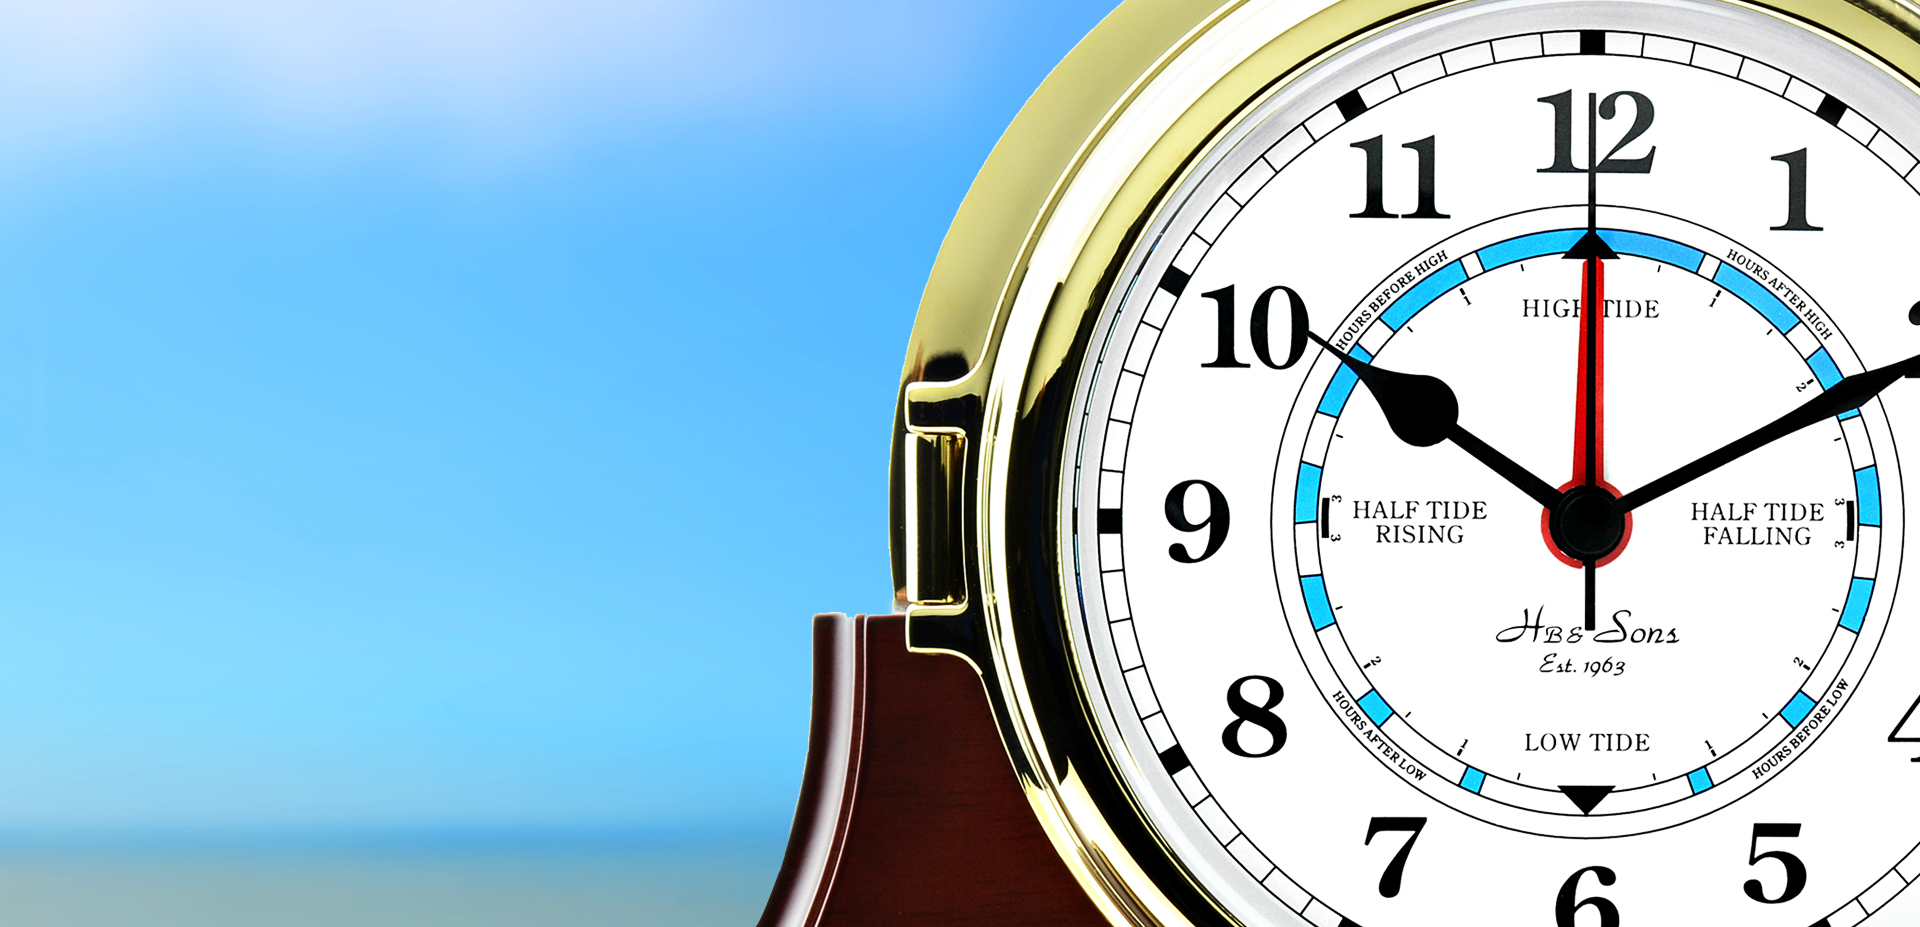 Ships Clock, Captain's Clock, Tide Clock